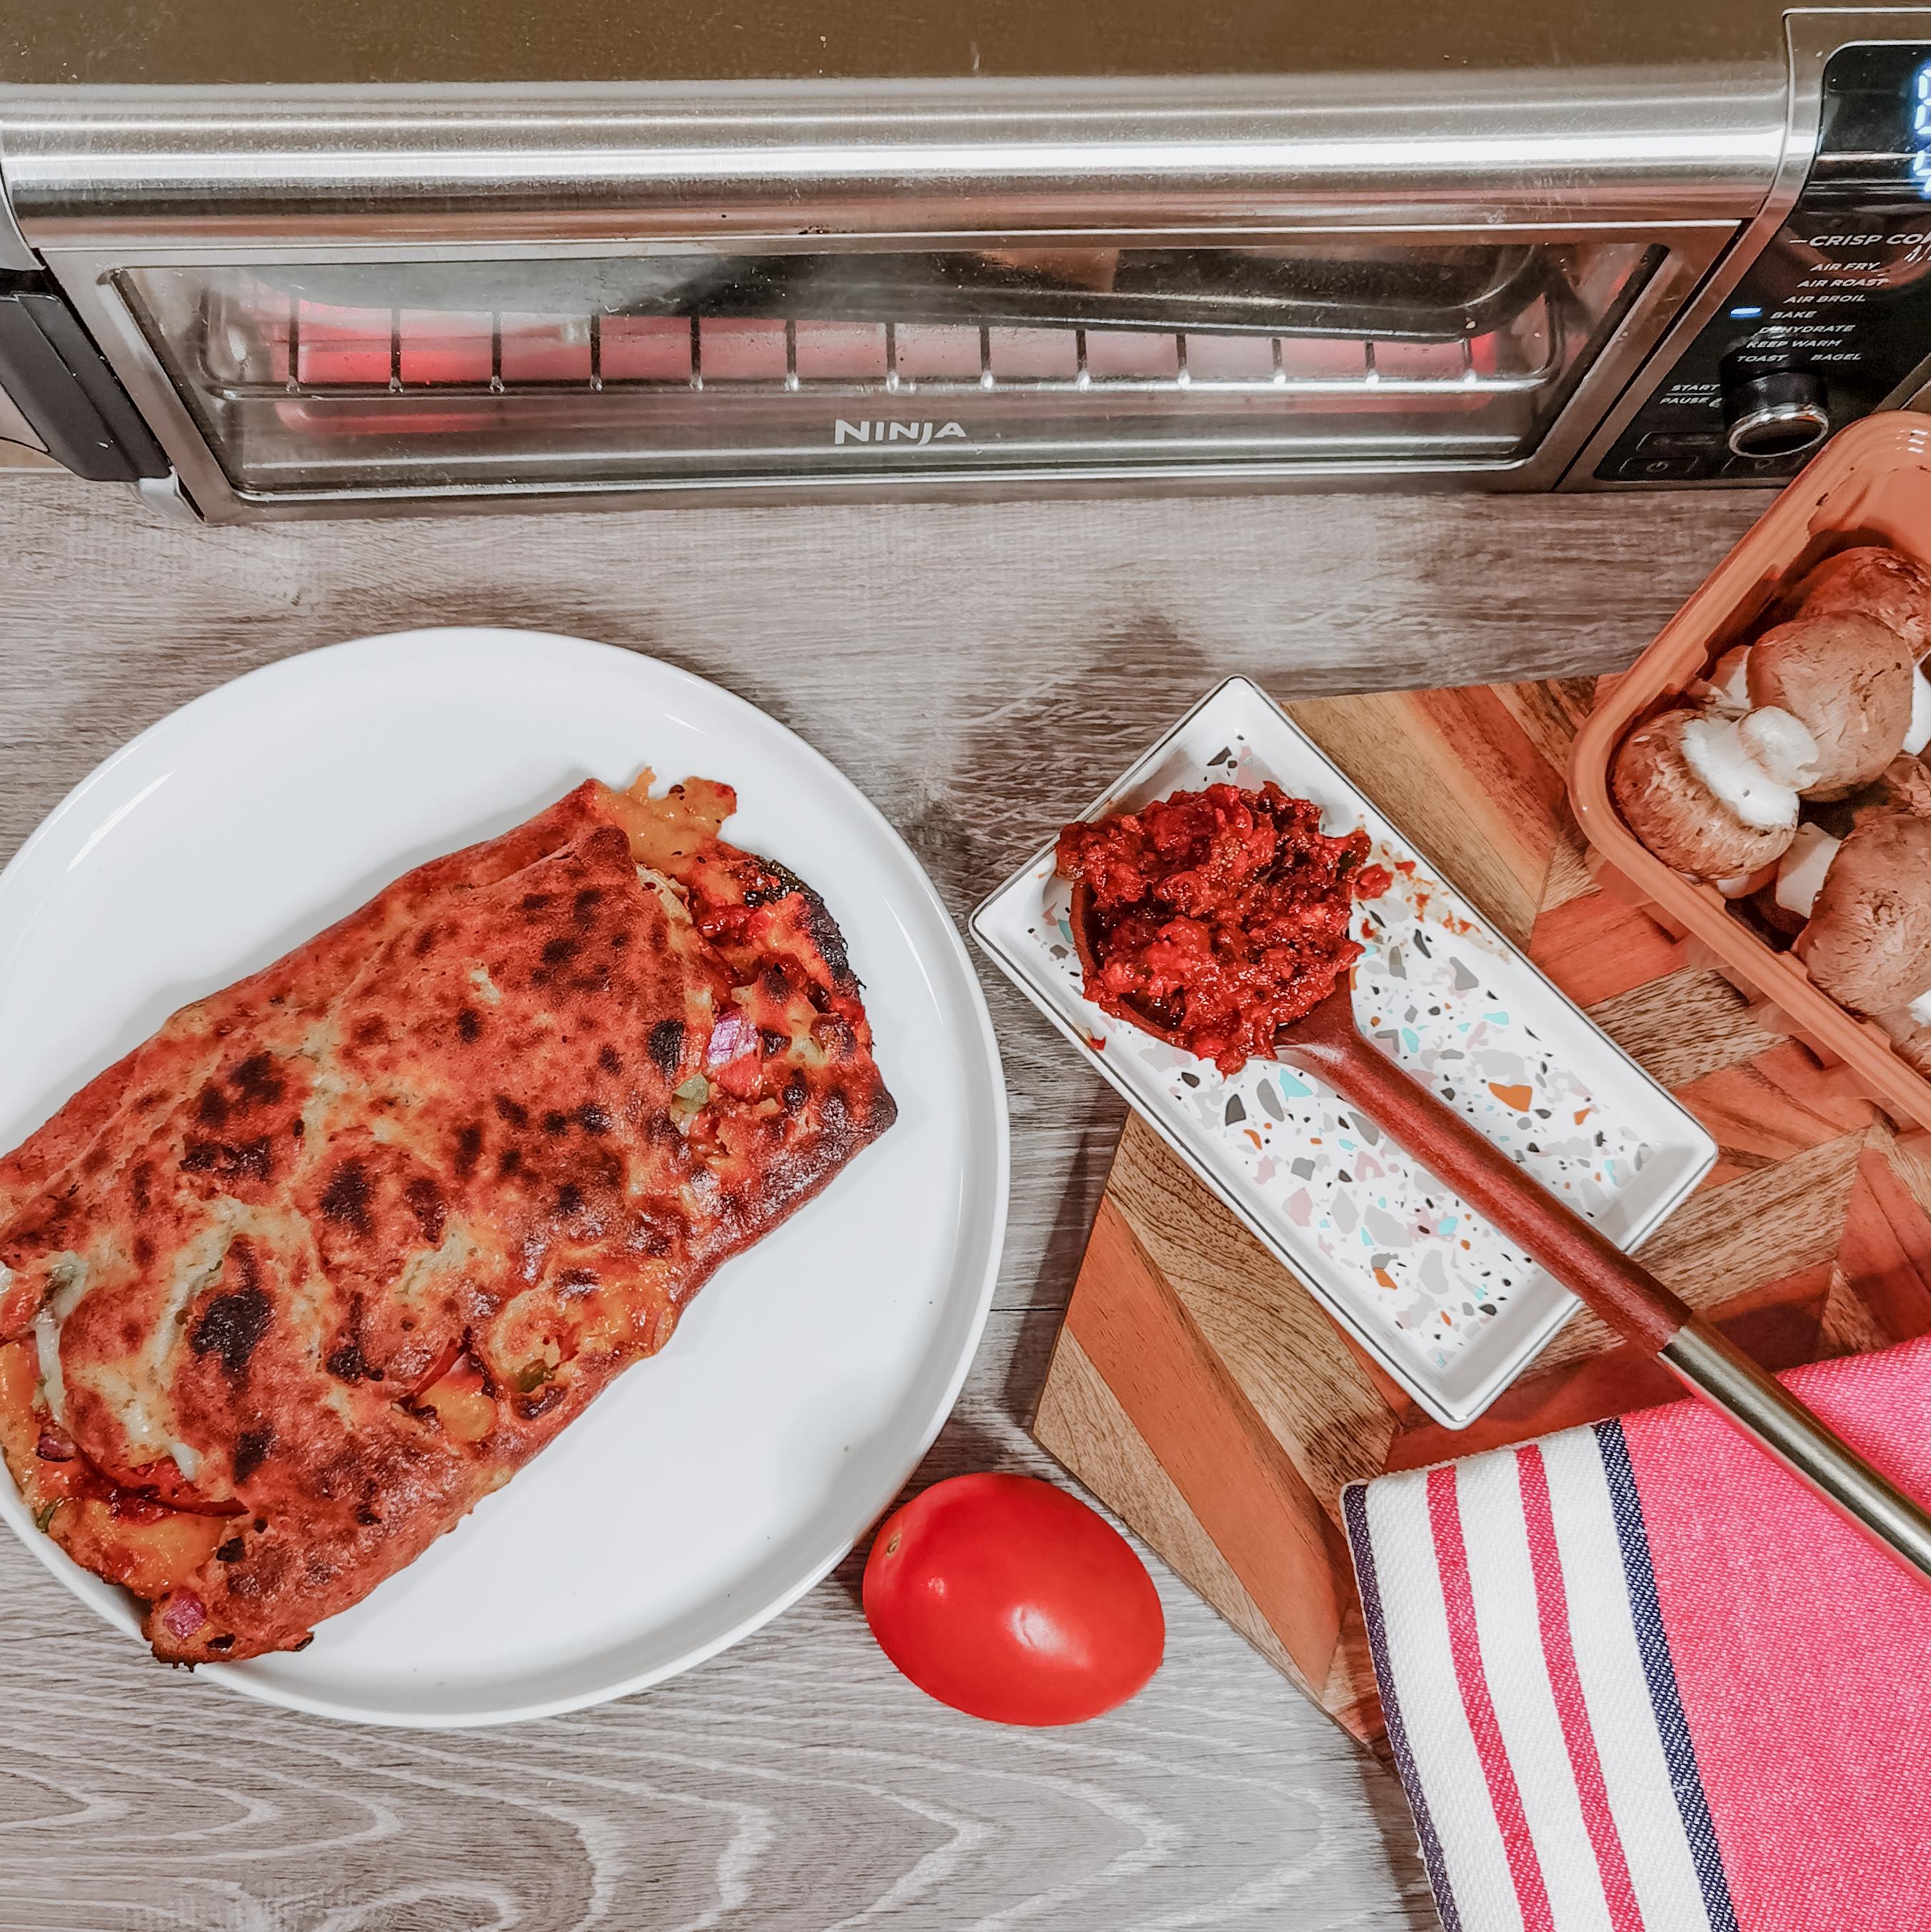 Ninja Foodi Digital Air Fry Oven - Stromboli - Recipe - Homemade - Ninja Kitchen Canada